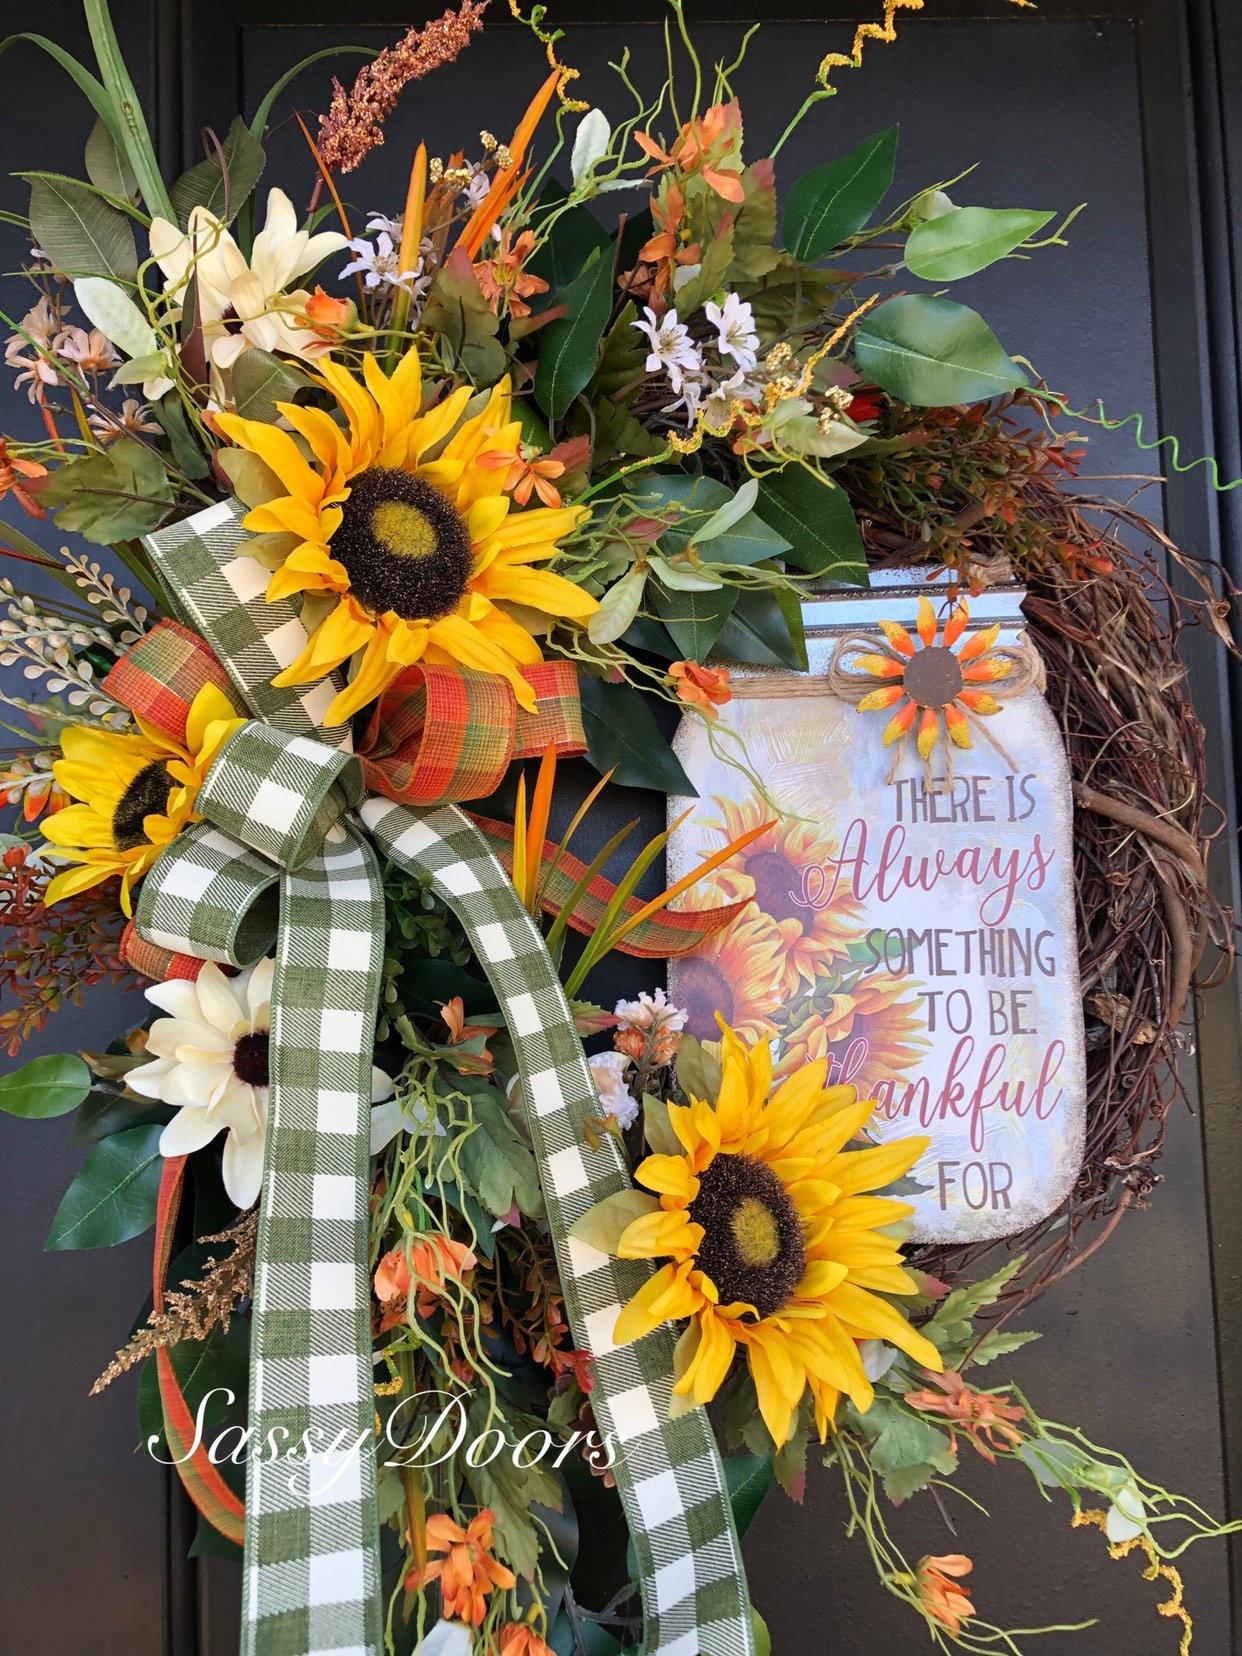 Fall Wreath Sunflower Wreath Front Door Wreath Autum Wreath Grapevine Wreath Thanksgiving Wreath Sassy Doors Wreath